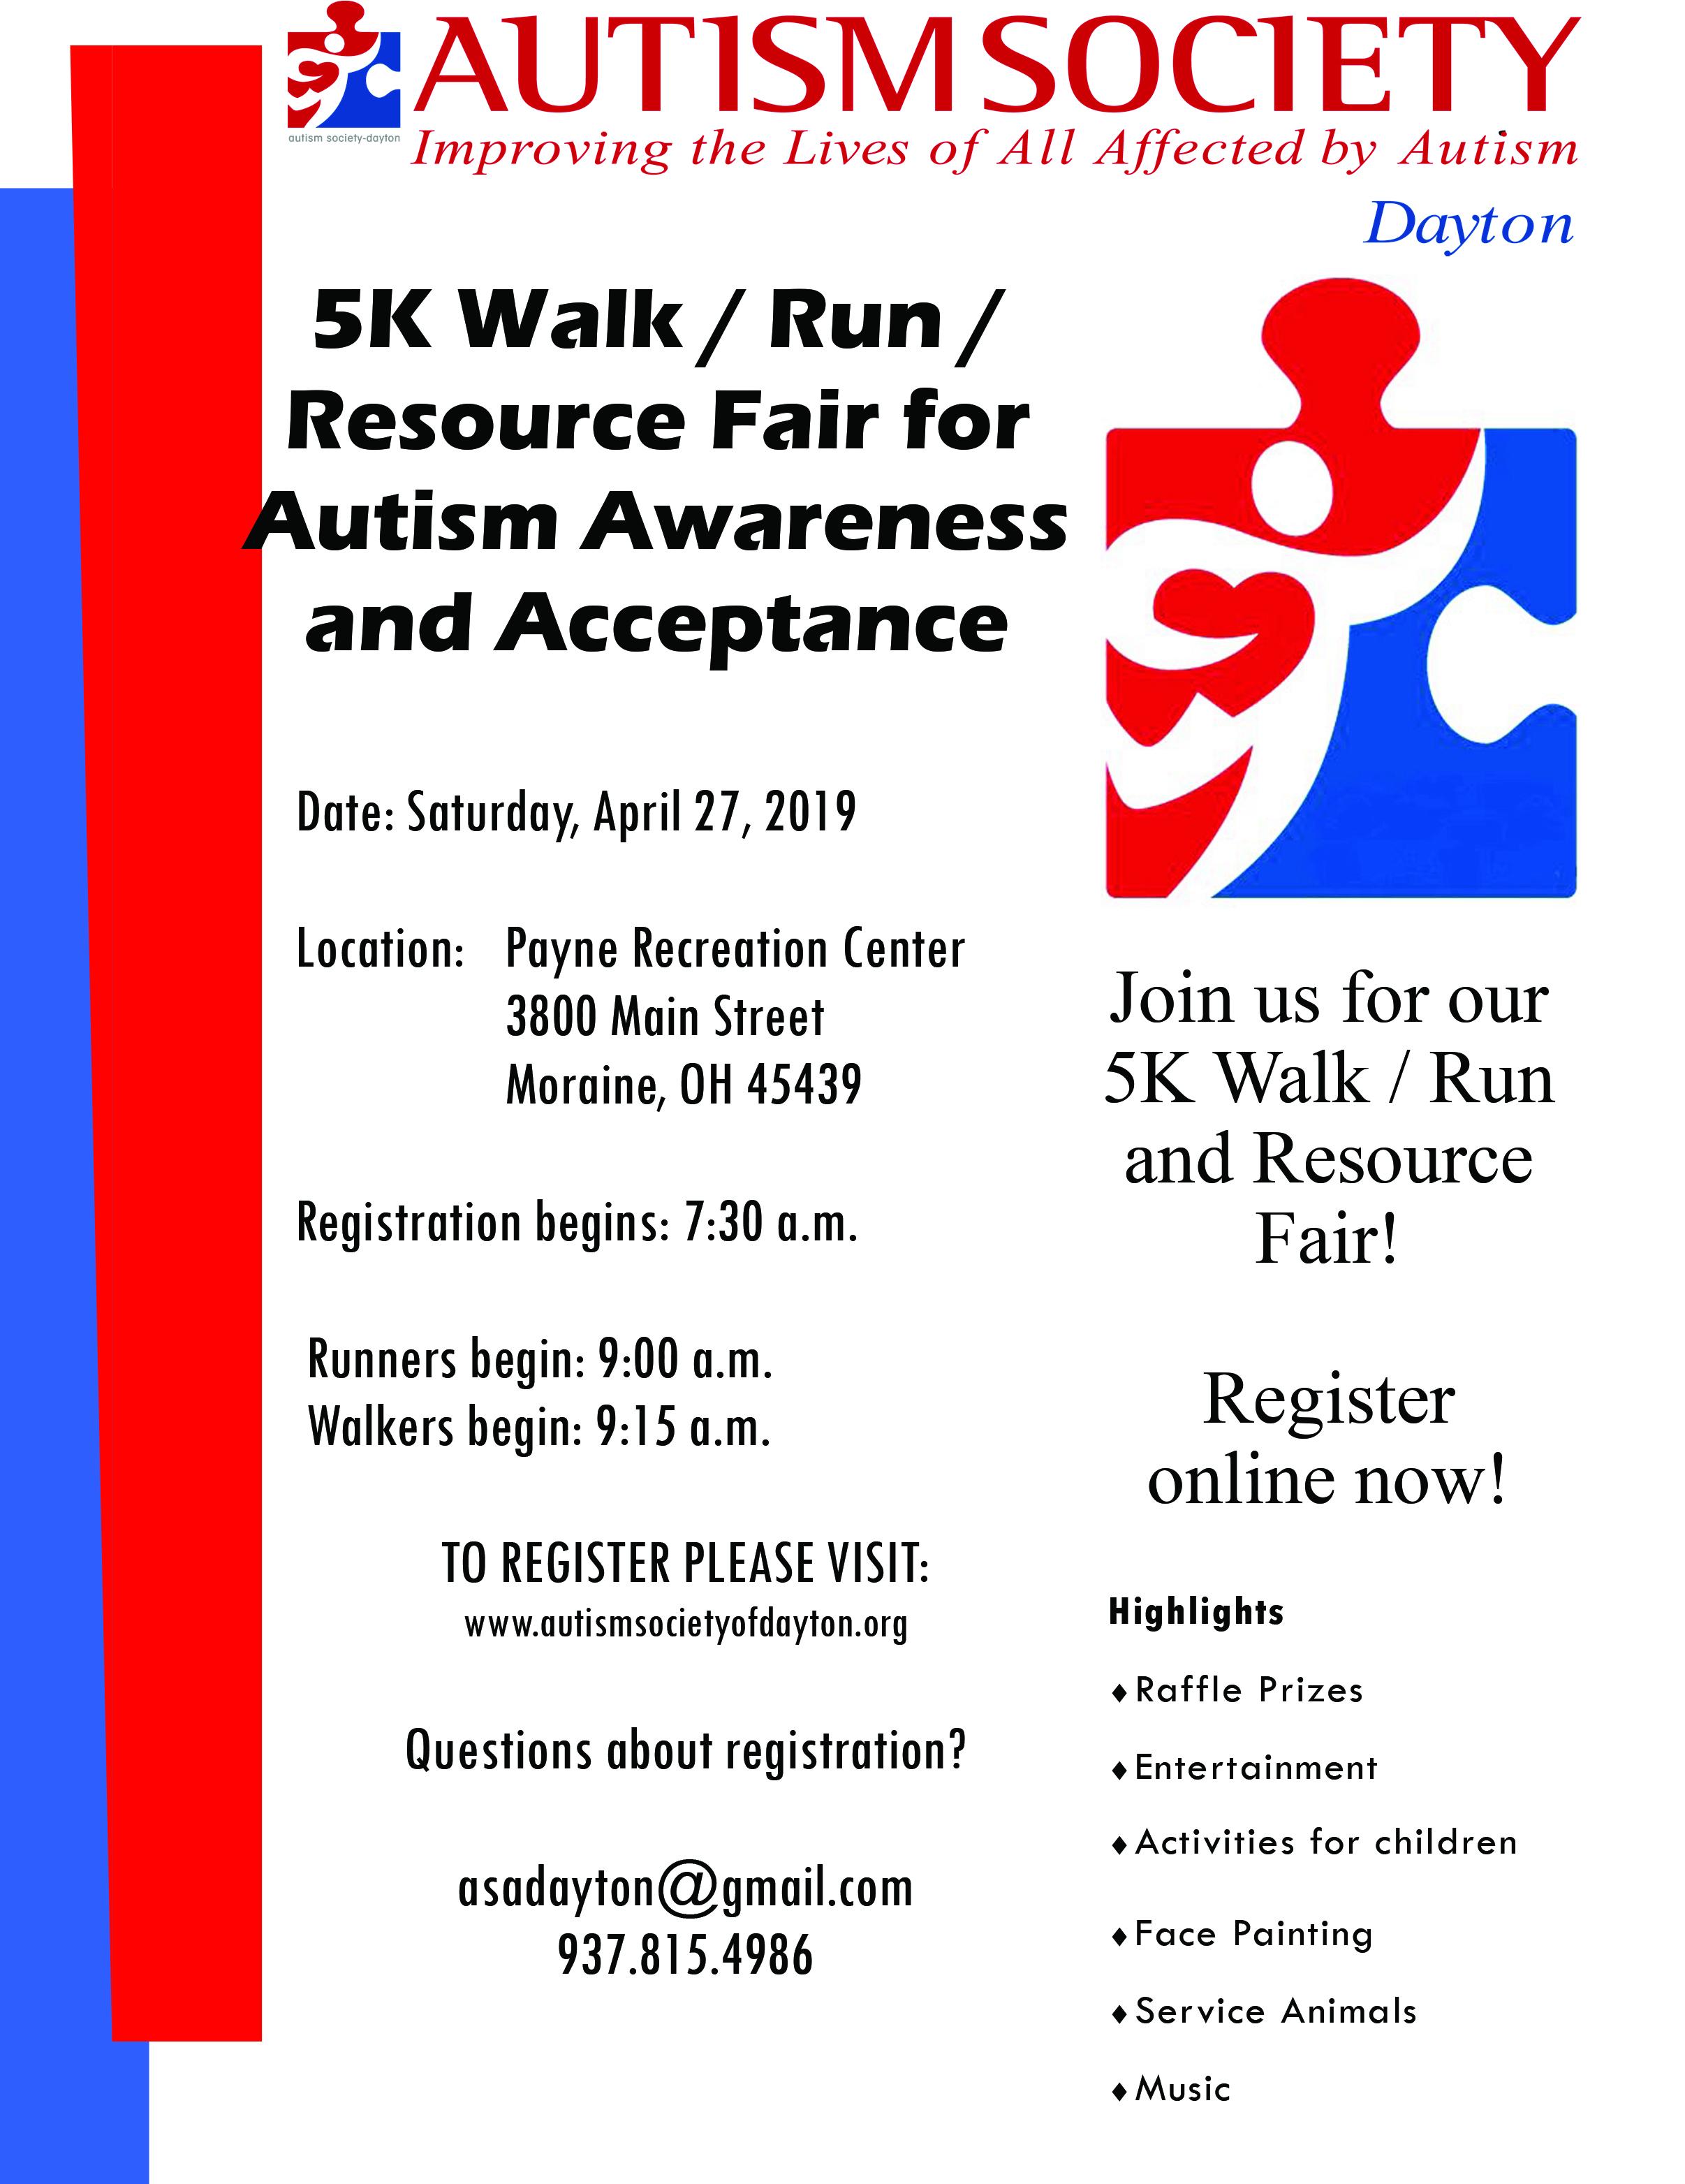 DAYTON, OH AUTISM SOCIETY 5K WALK/RUN & RESOURCE FAIR: APRIL 27th, 2019